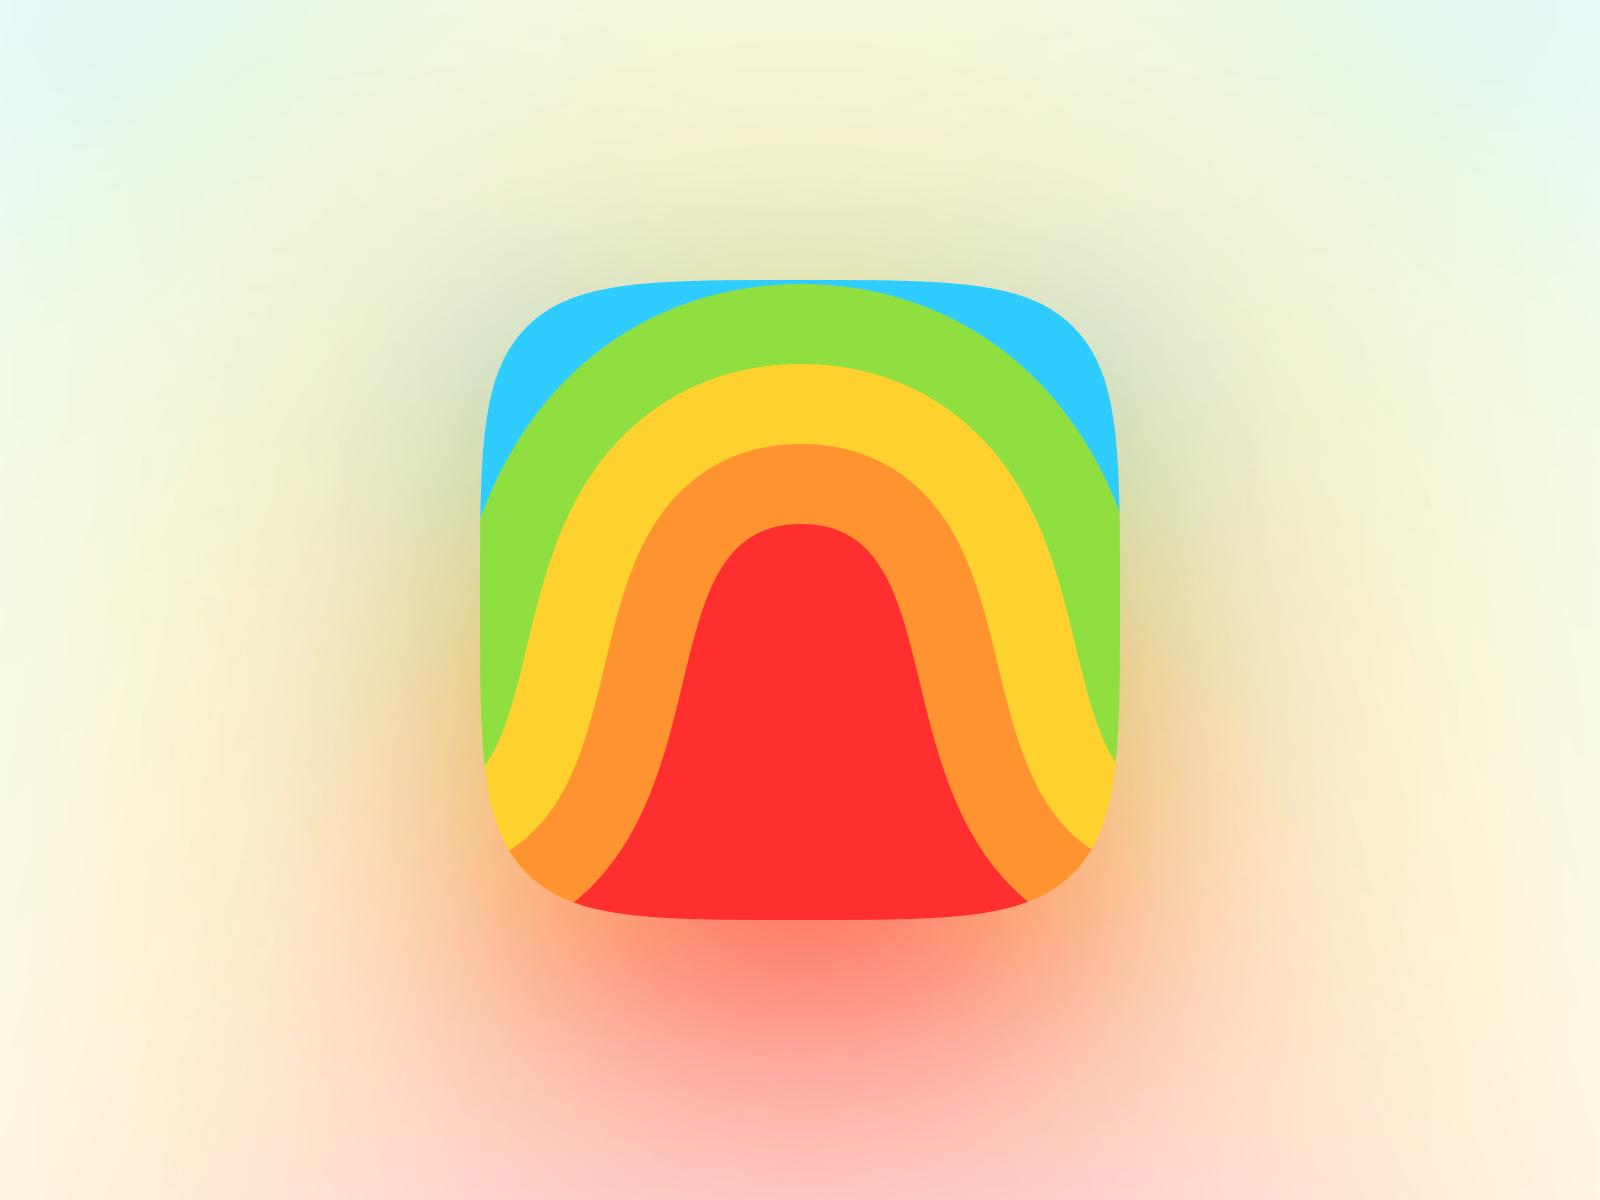 Space rainbow 1